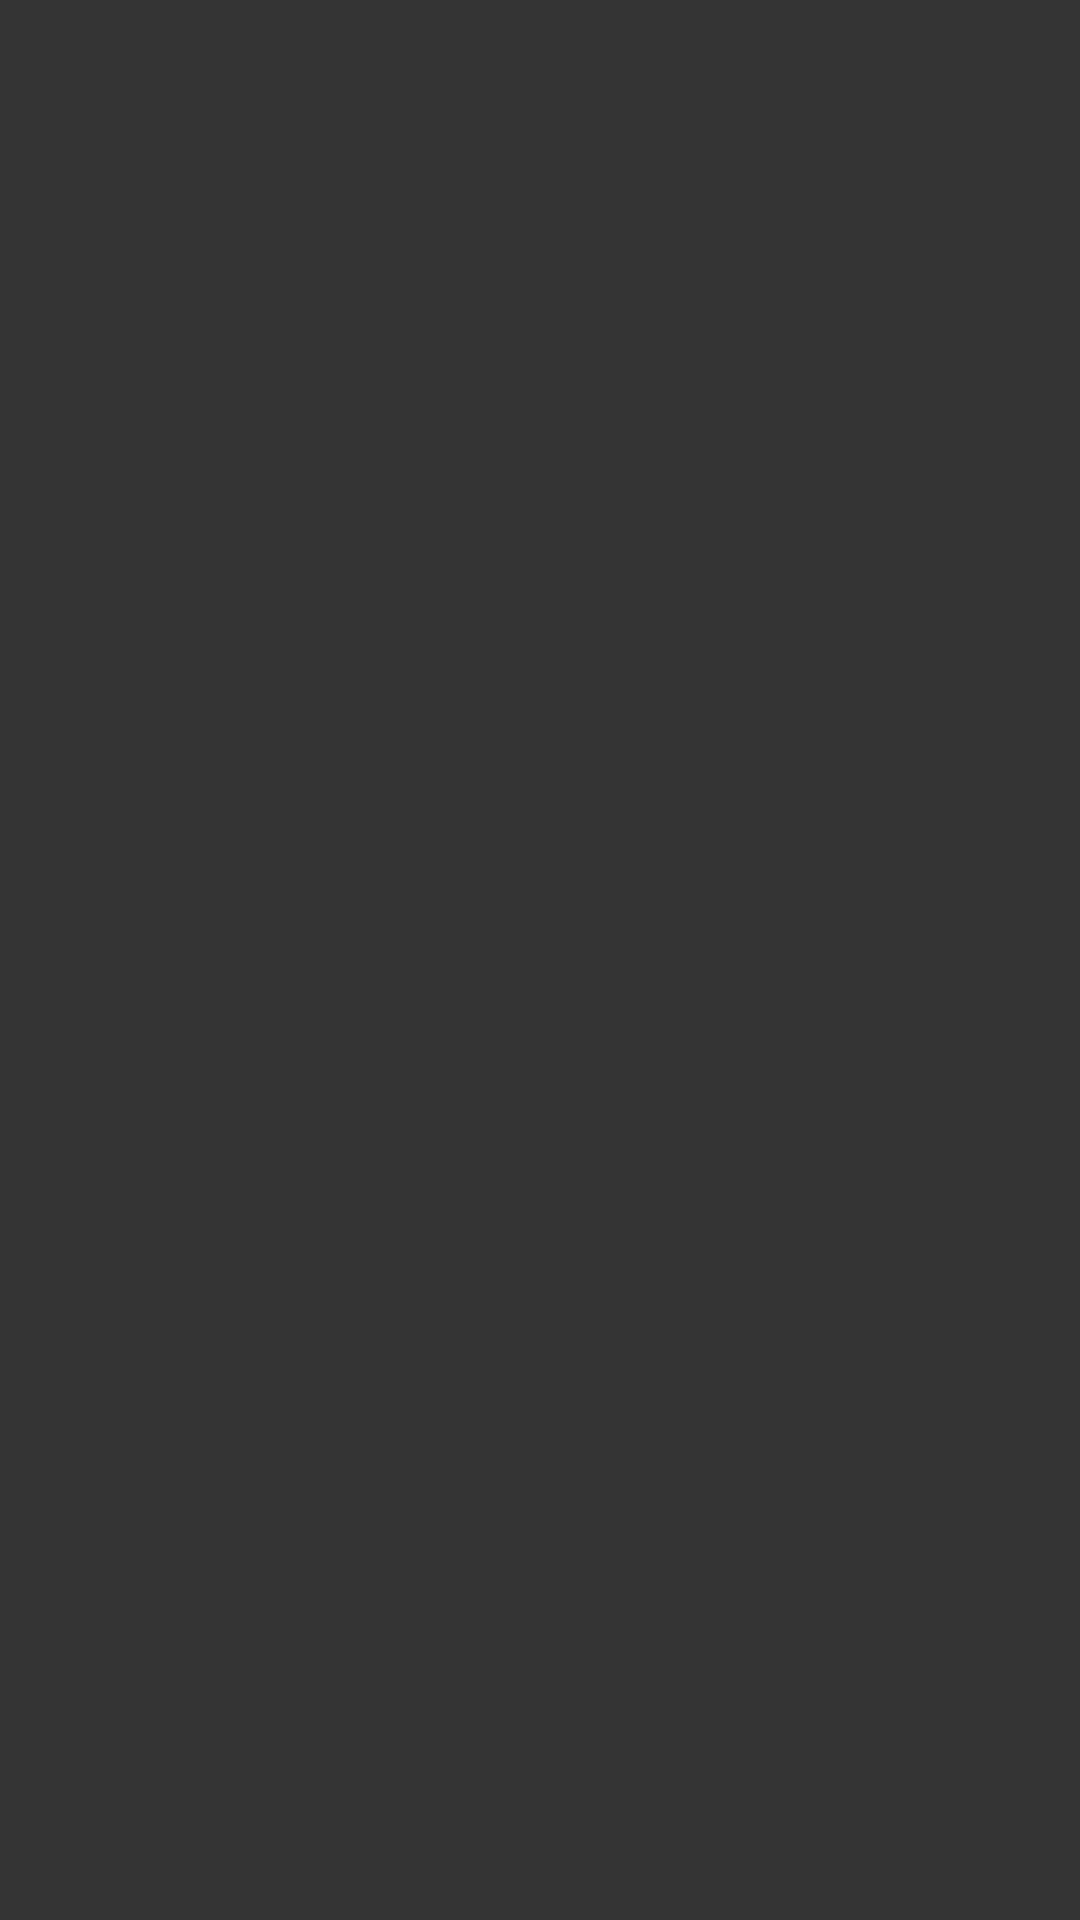 1080x1920 Jet Solid Color Background